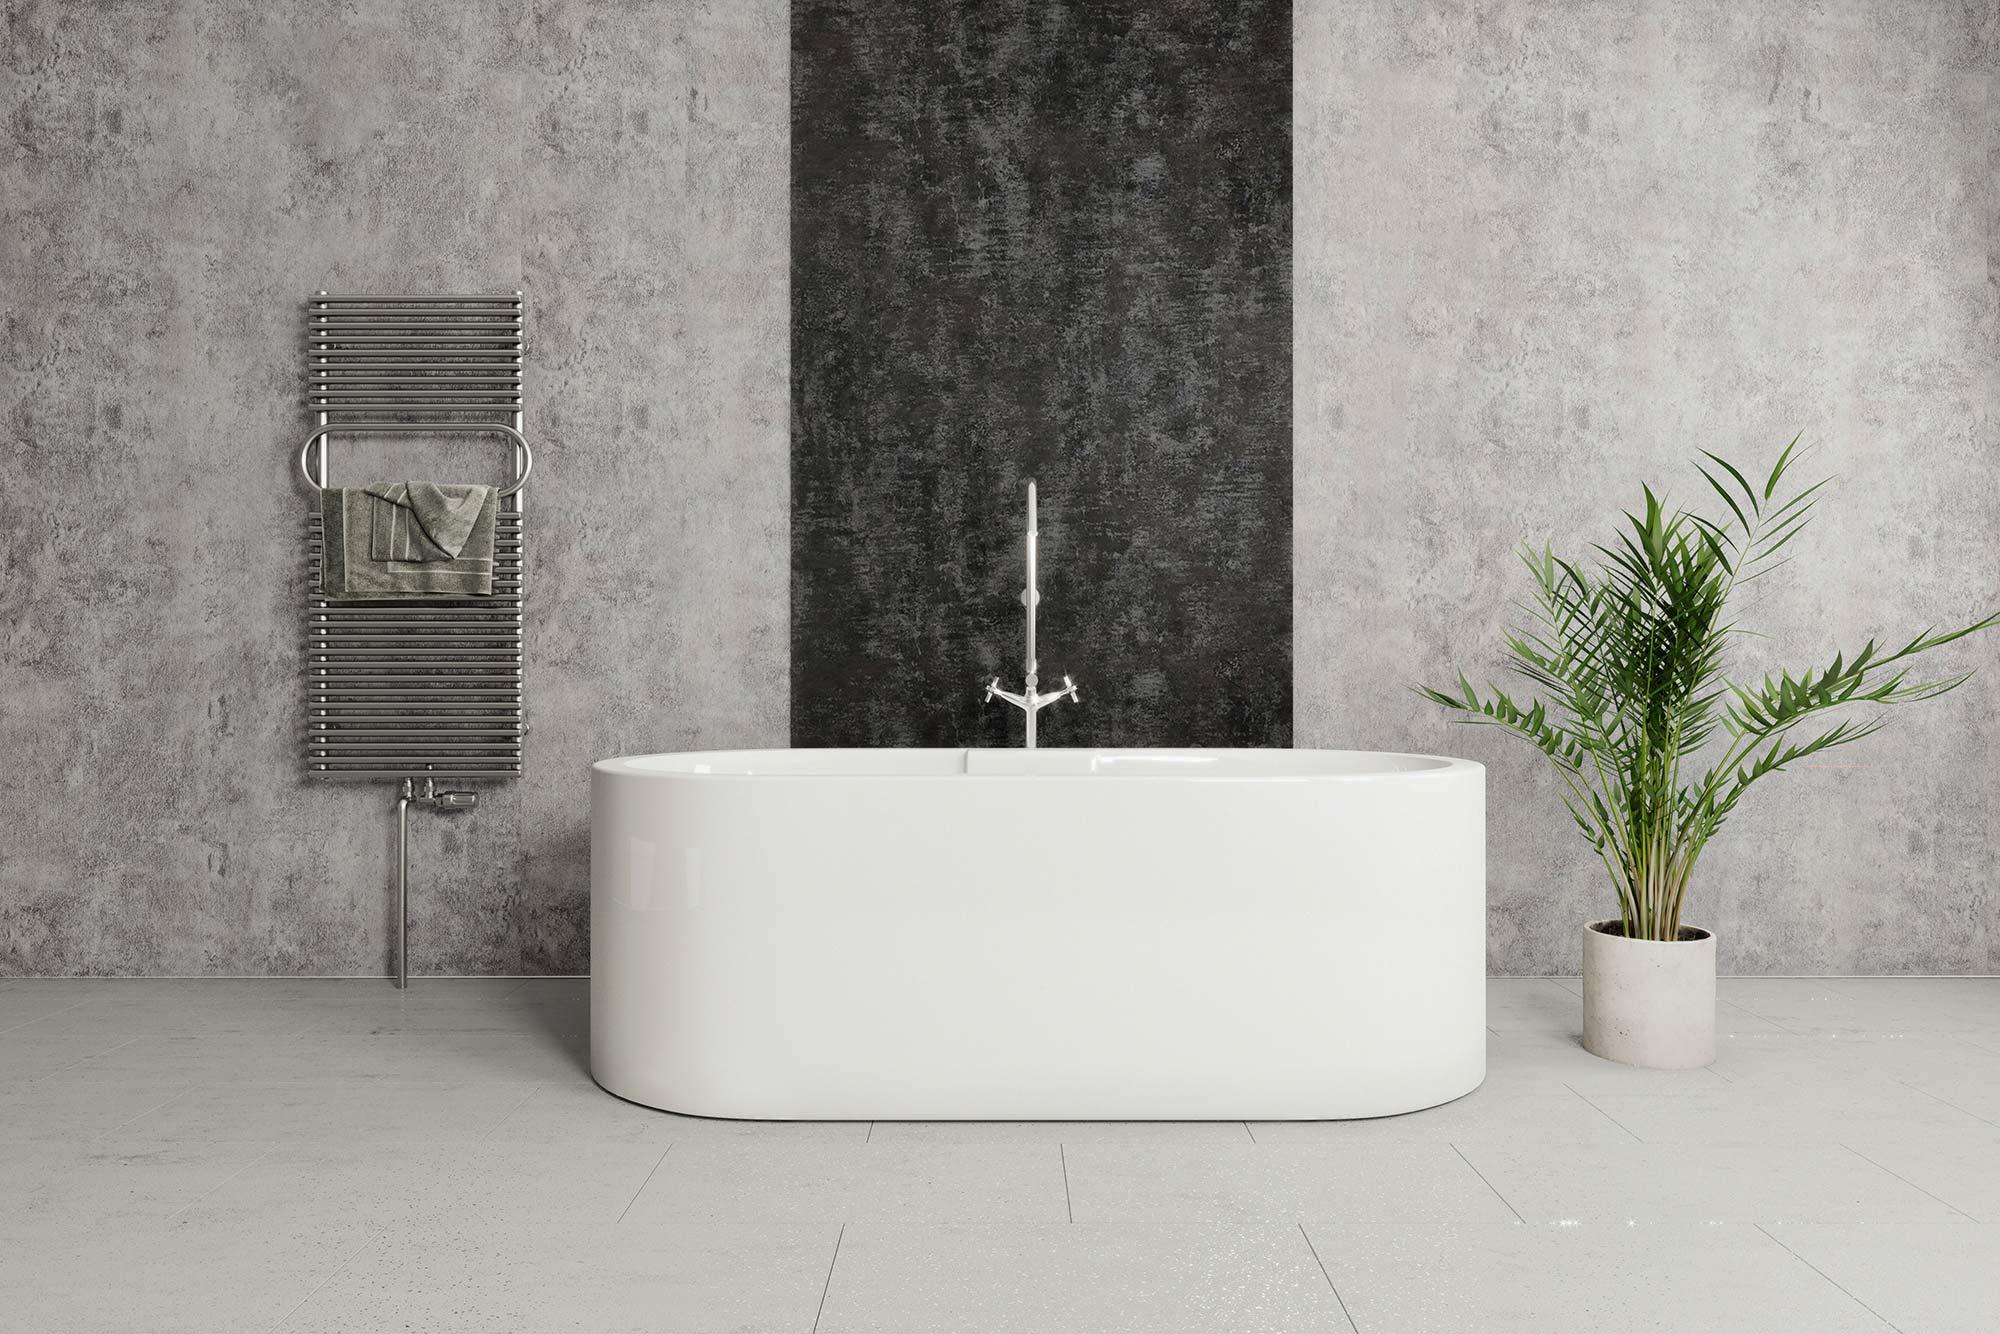 Graphite Elements Bathroom Cladding Direct